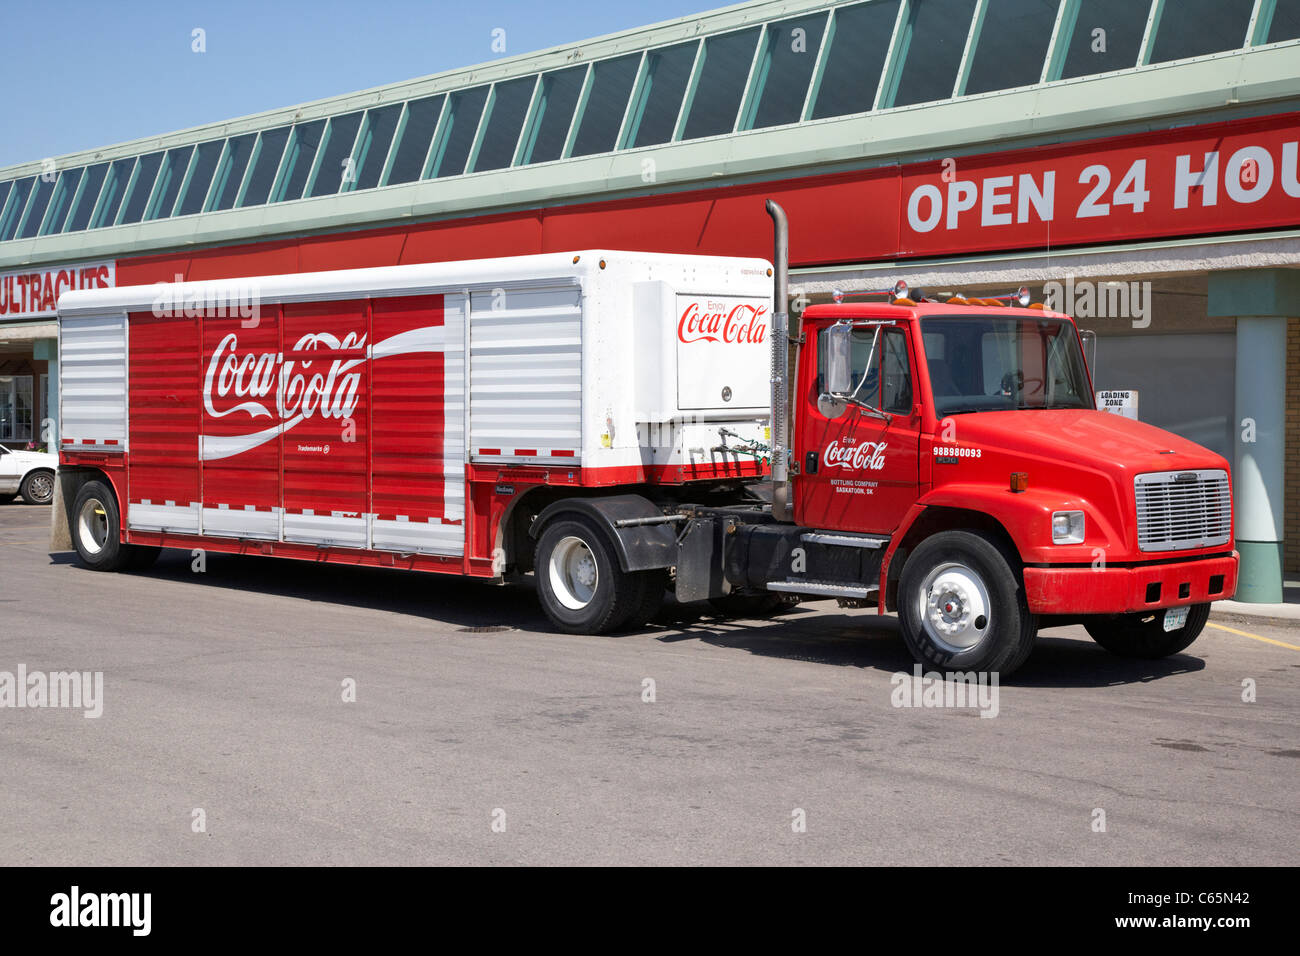 coca-cola delivery truck Saskatoon Saskatchewan Canada - Stock Image